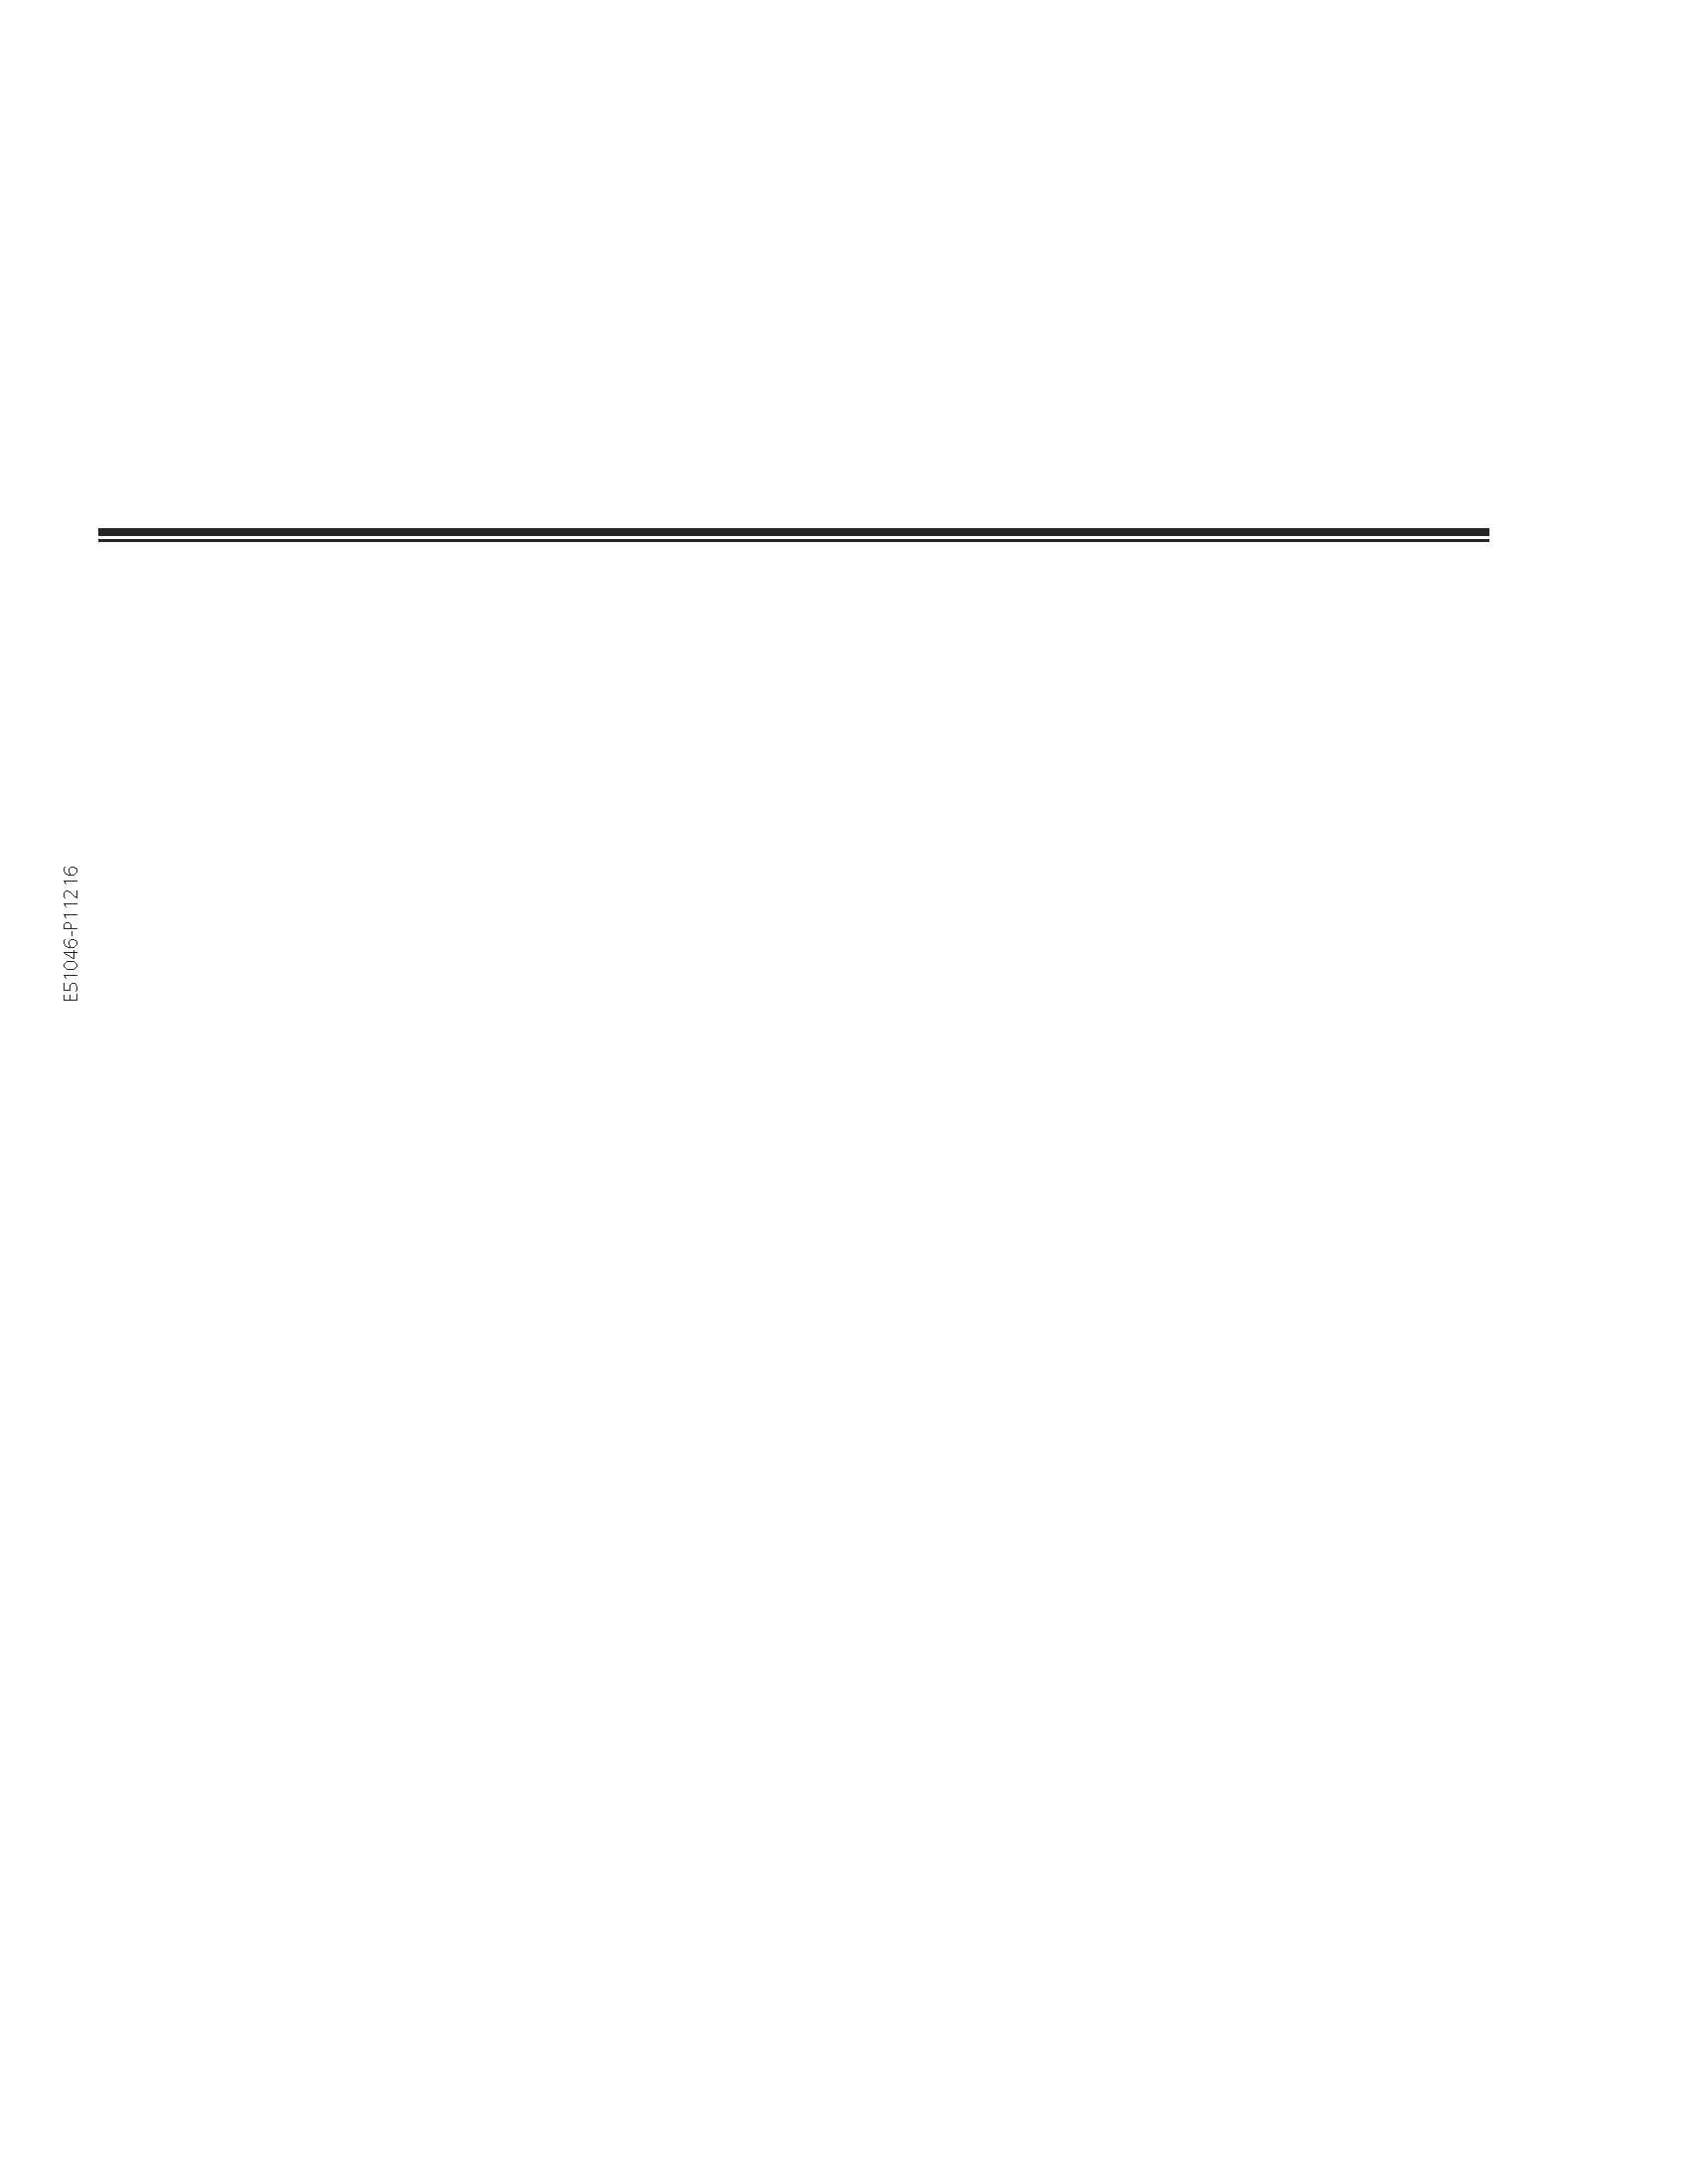 NOTICECARDPAGE4.JPG